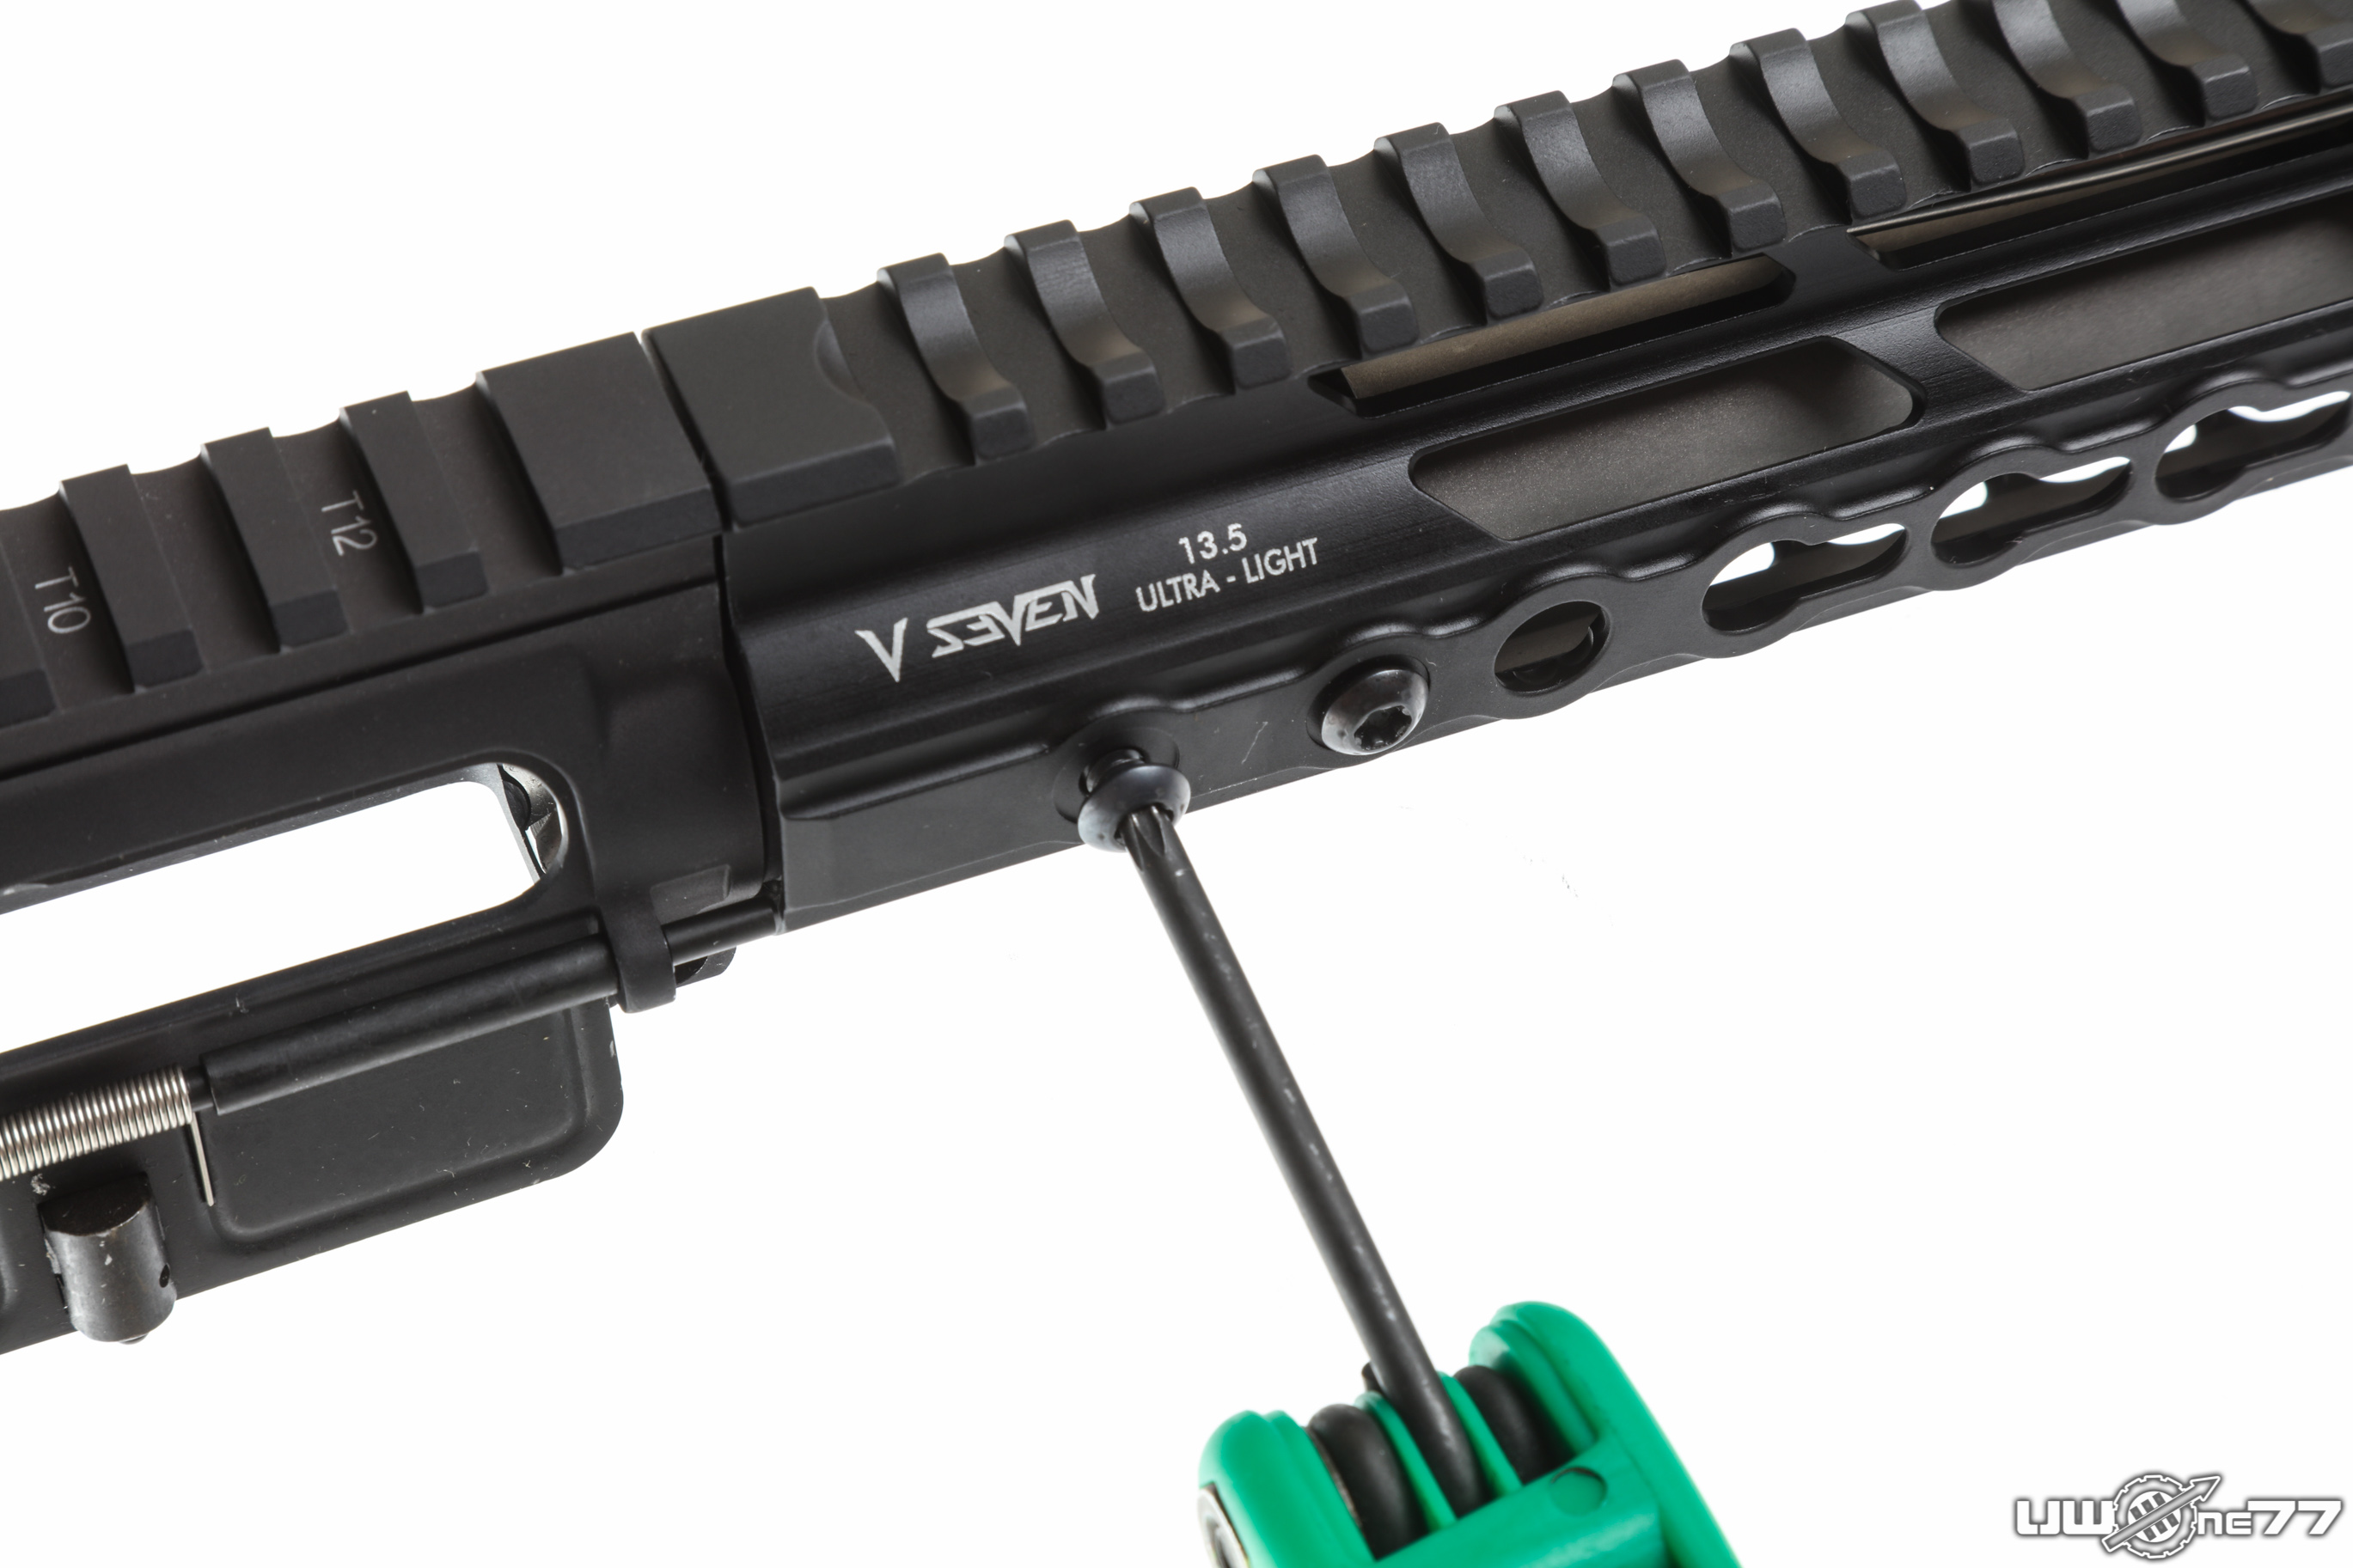 V Seven Ultralight KeyMod Handguard